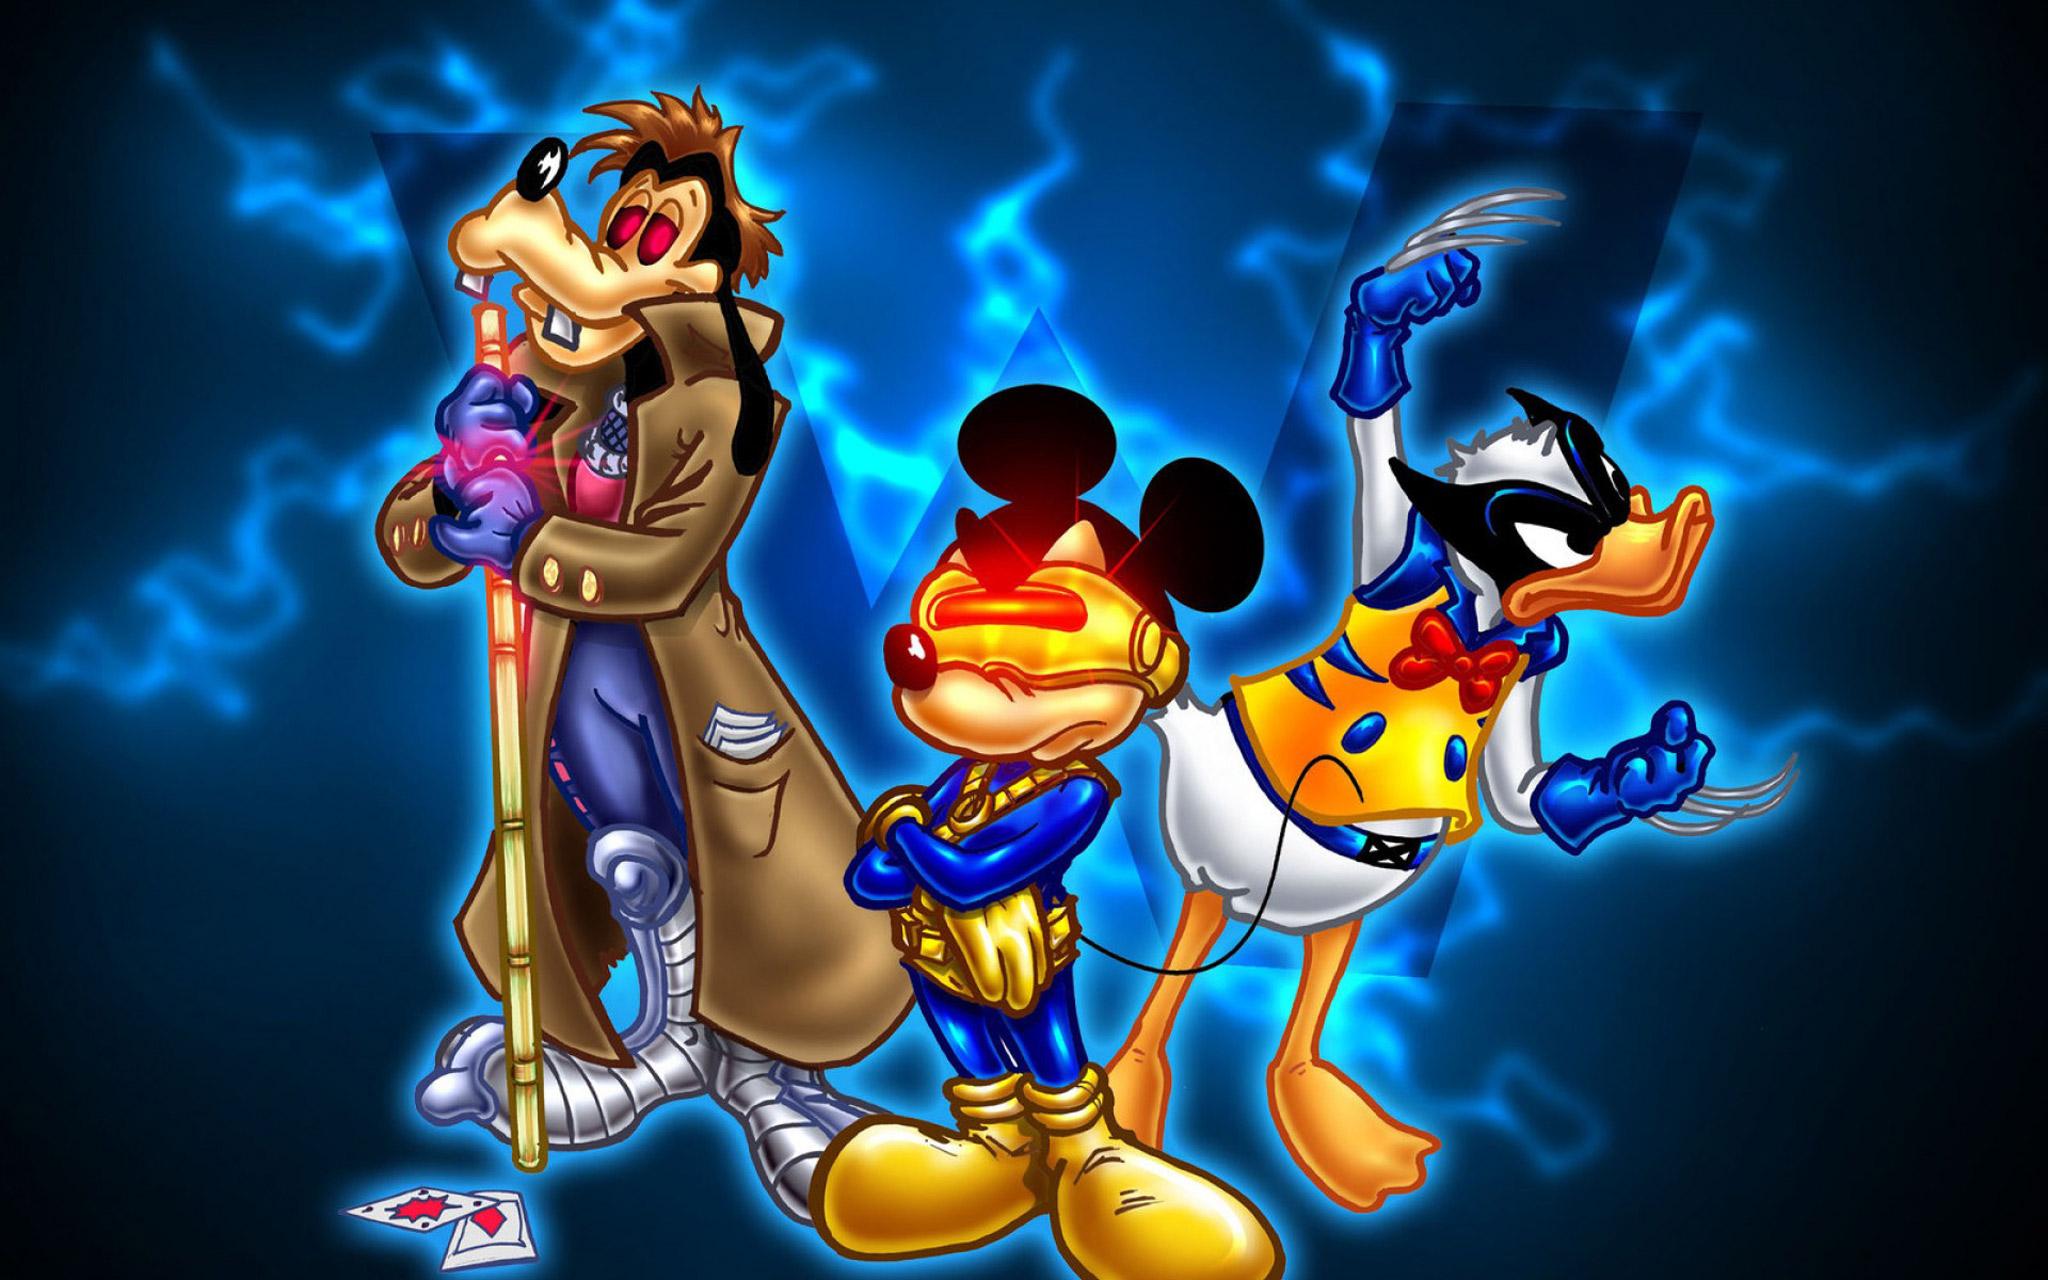 Goofy Mickey Mouse And Donald Duck Desktop Wallpaper Hdconv